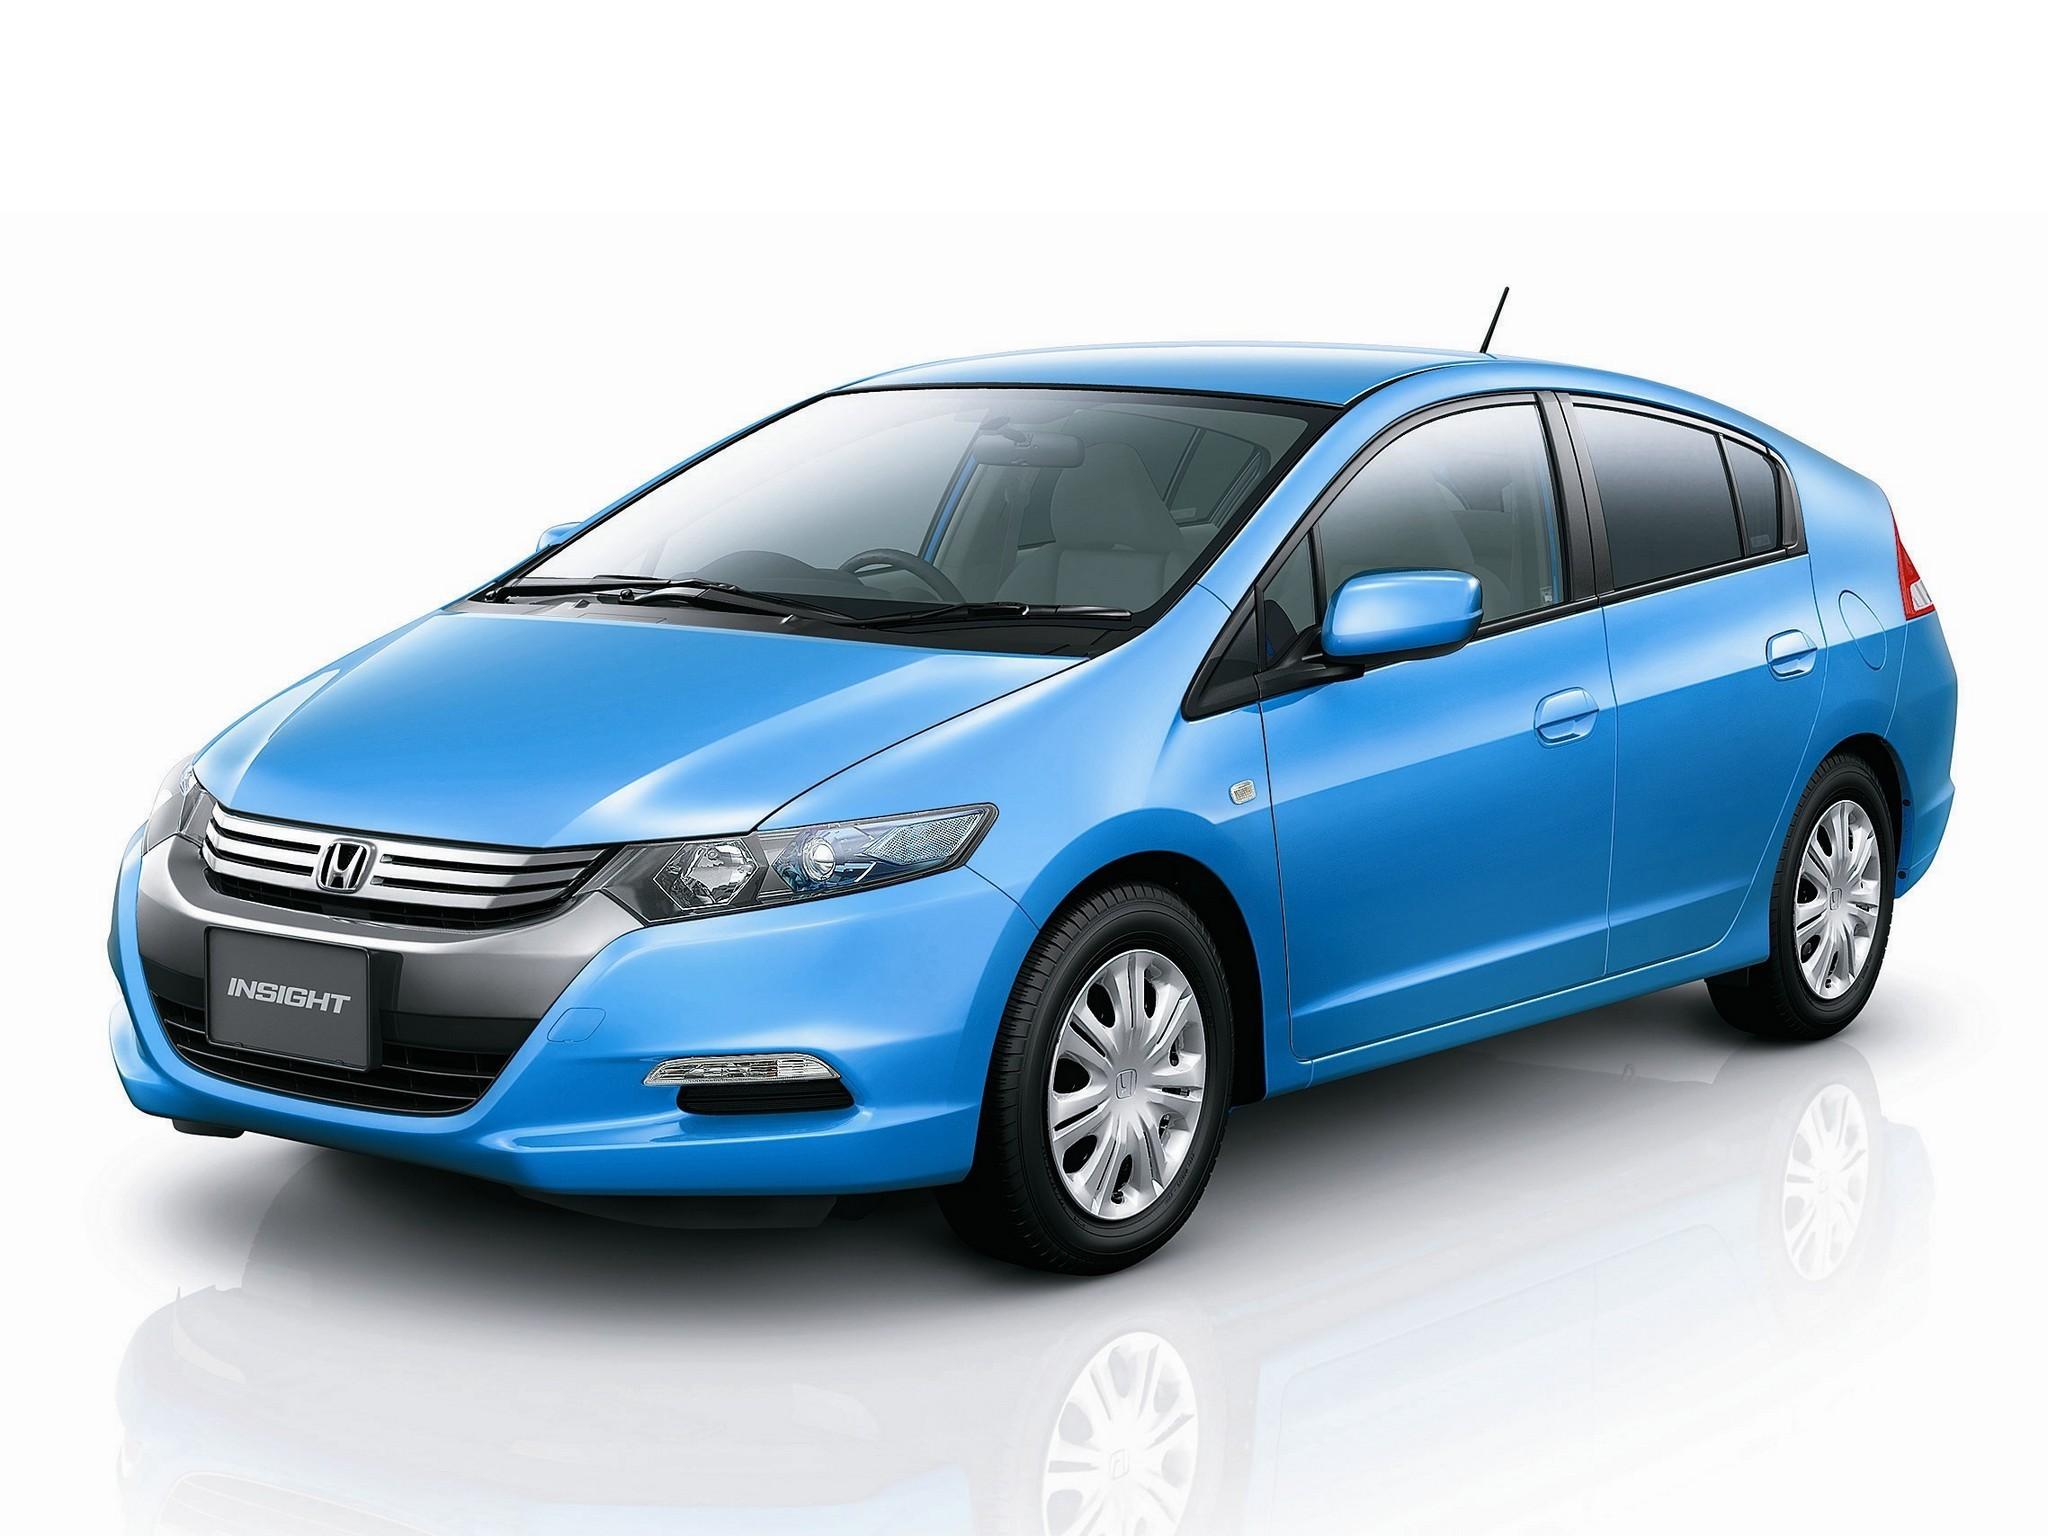 HONDA Insight - 2009, 2010, 2011, 2012 - autoevolution